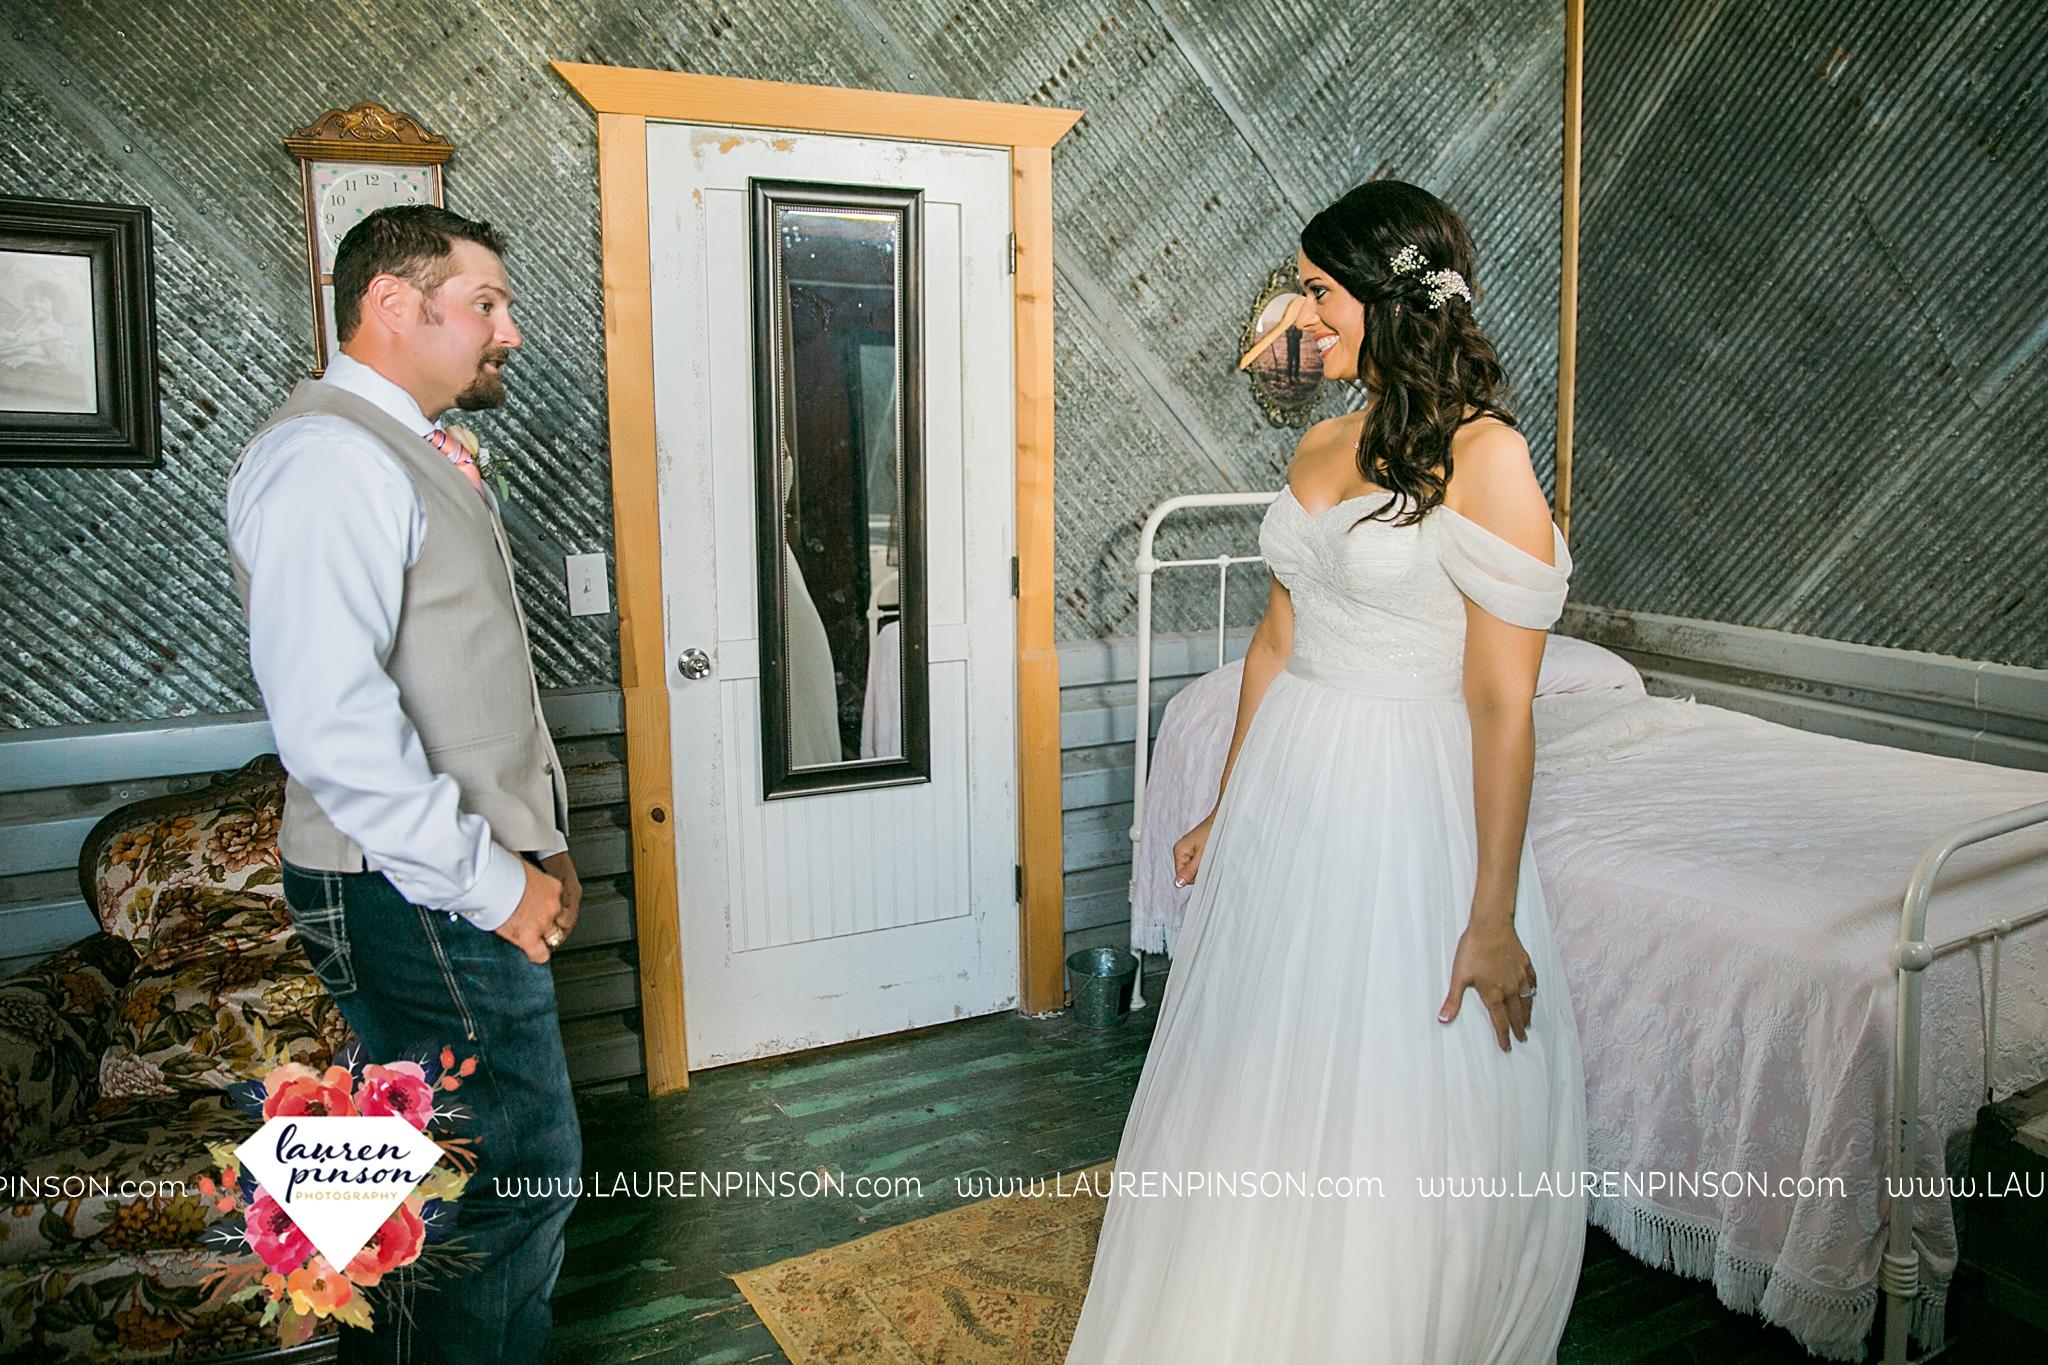 jones-barn-willow-creek-ranch-wedding-in-cleburne-texas-fort-worth-dfw-wichita-falls-wedding-photography_3200.jpg